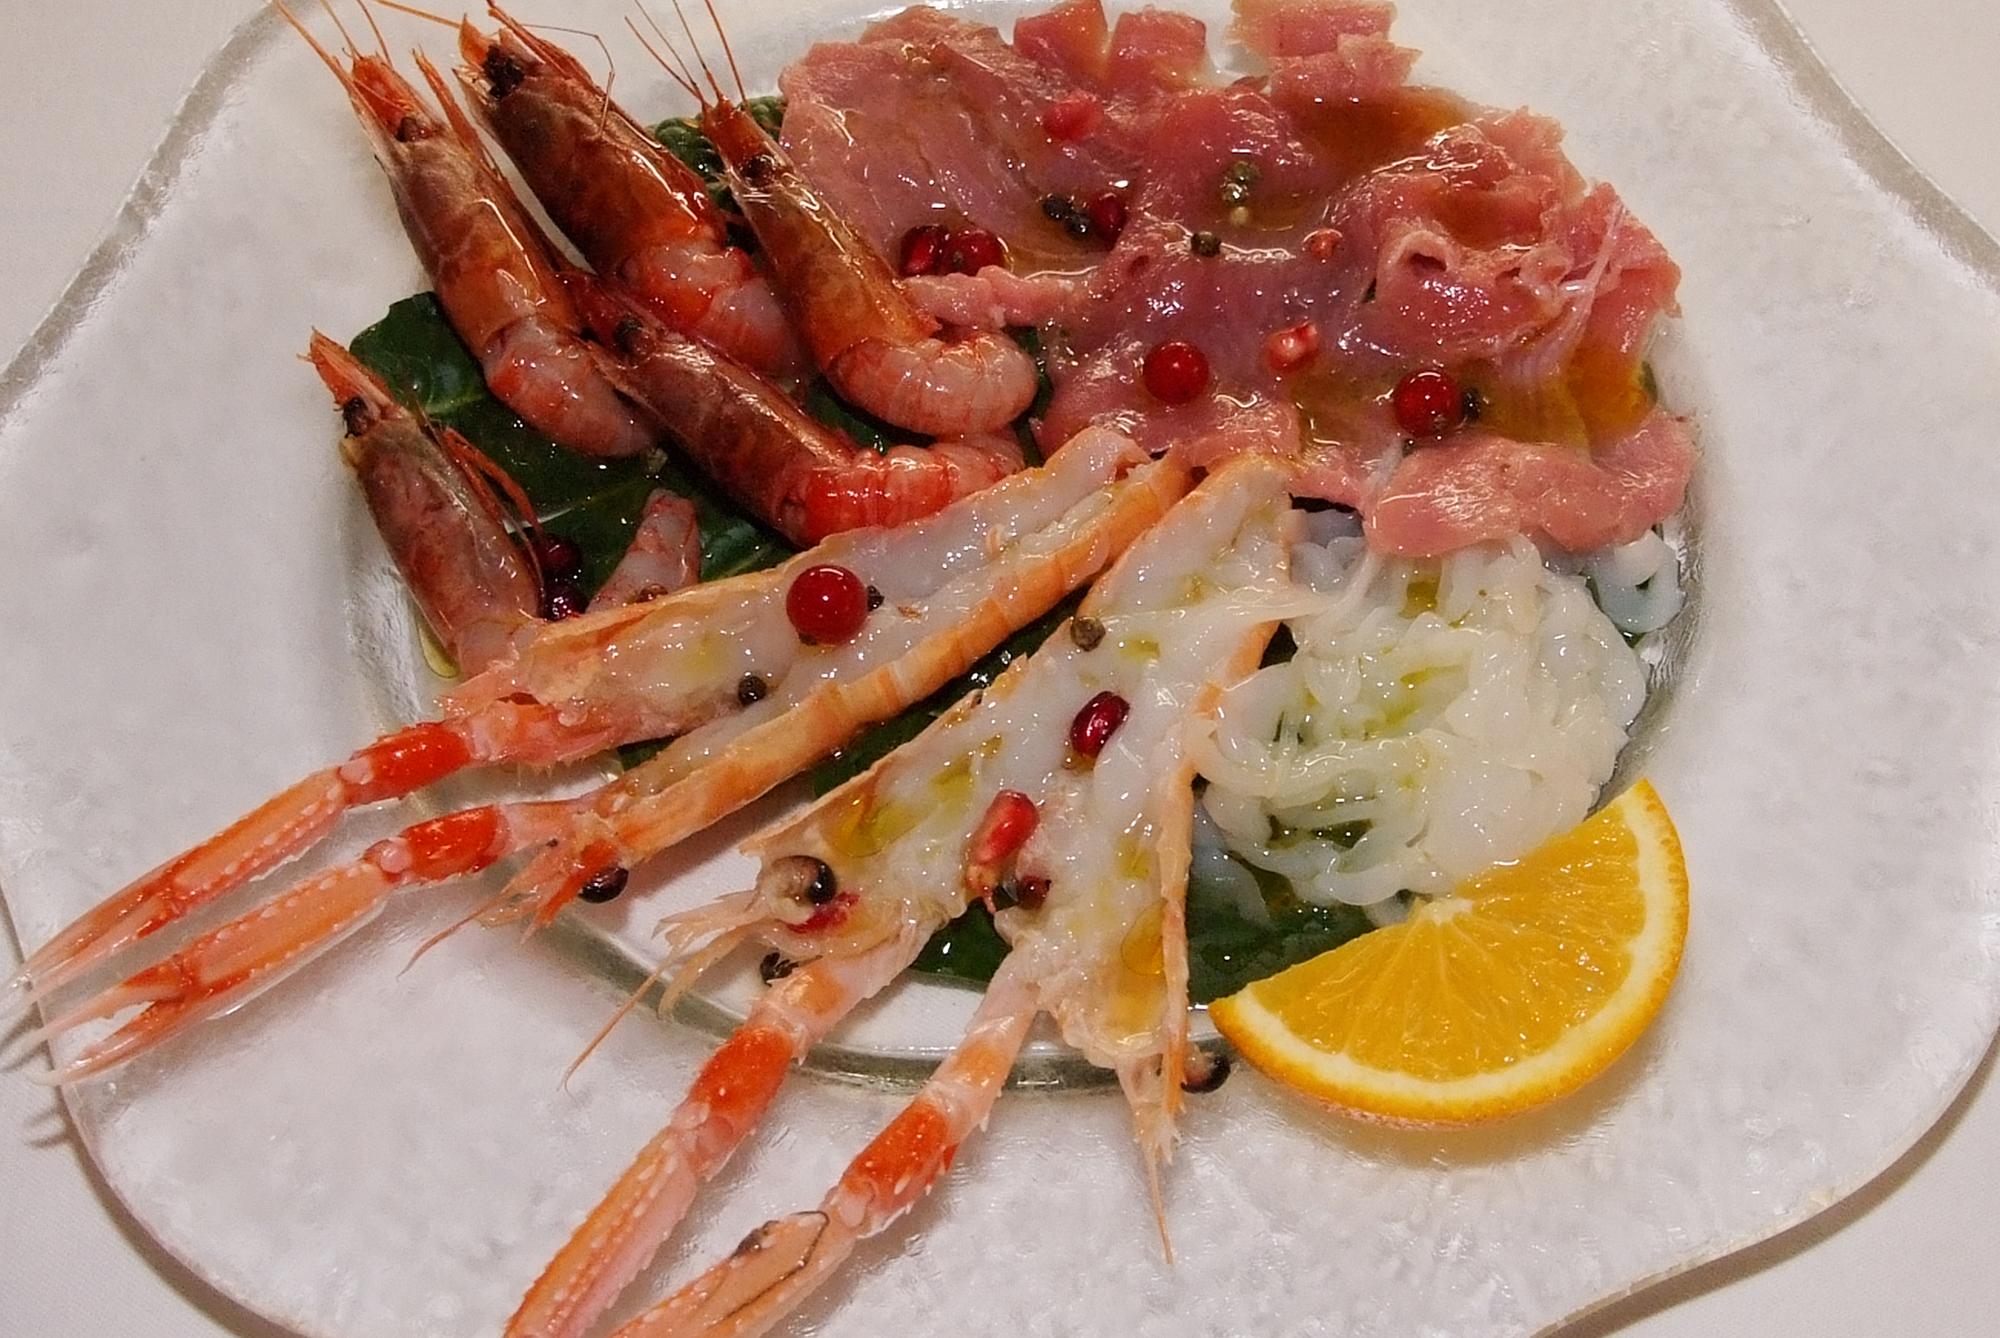 ristorante pesce crudo roma prati